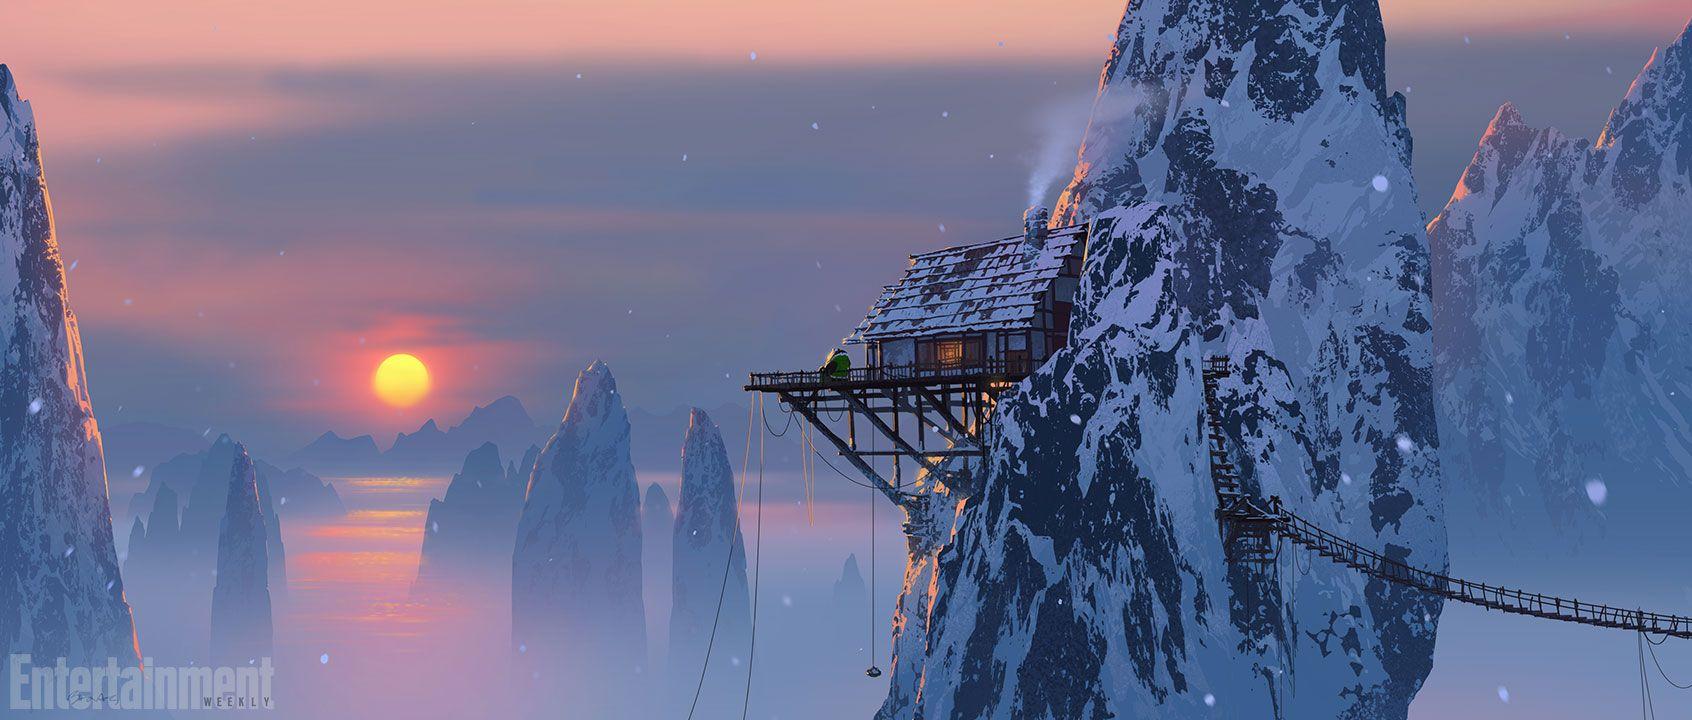 Breathtaking 'Kung Fu Panda 3' Concept Art Reveals Panda Village